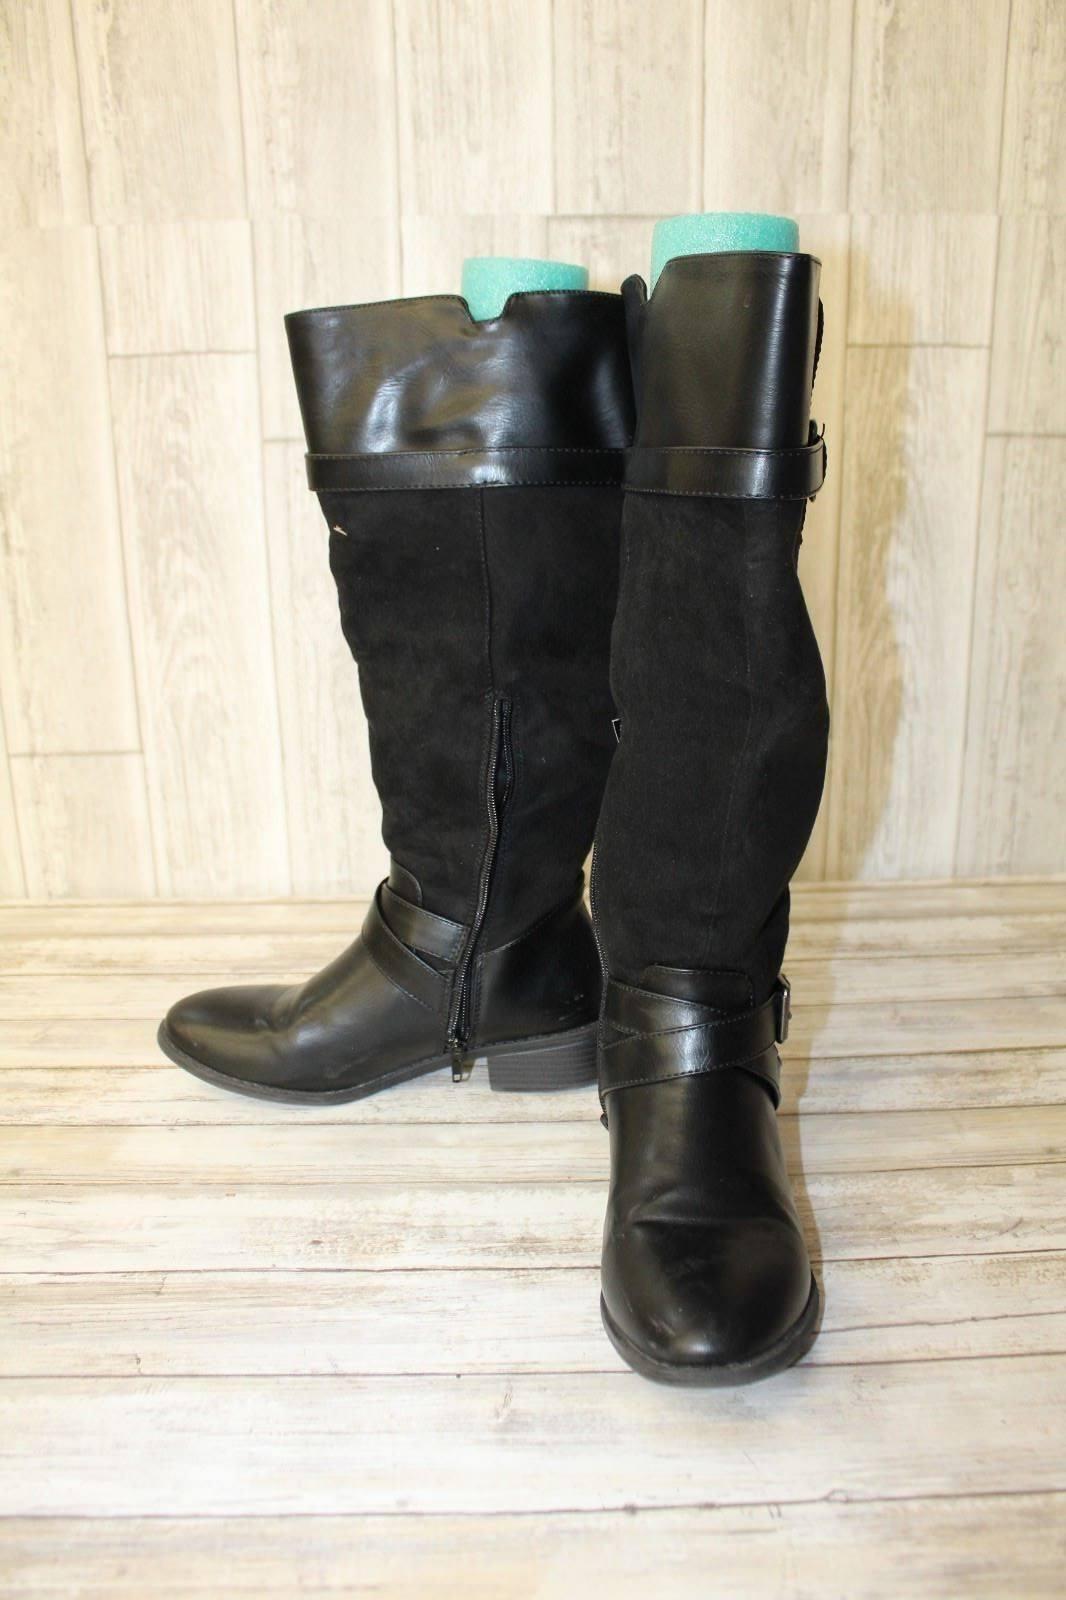 Rampage Ireena Tall Boots - Women's Size 7W Wide Calf Black